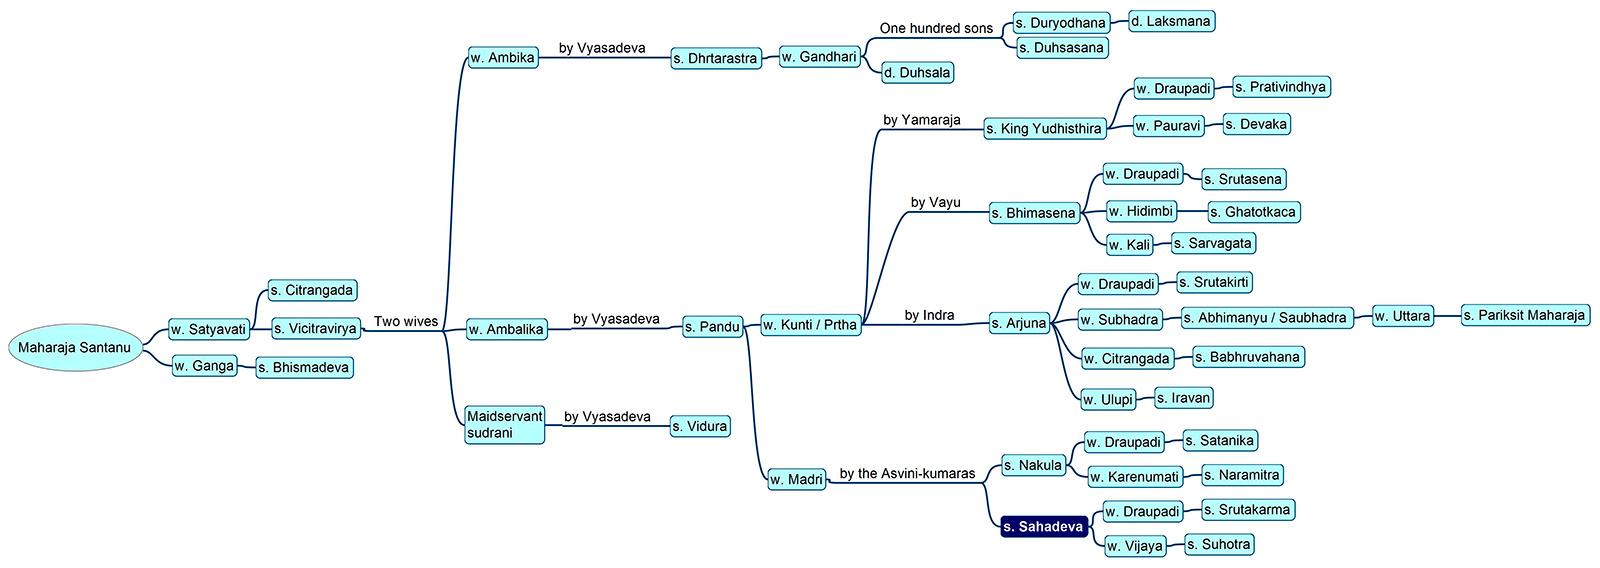 Family tree of Bhīma